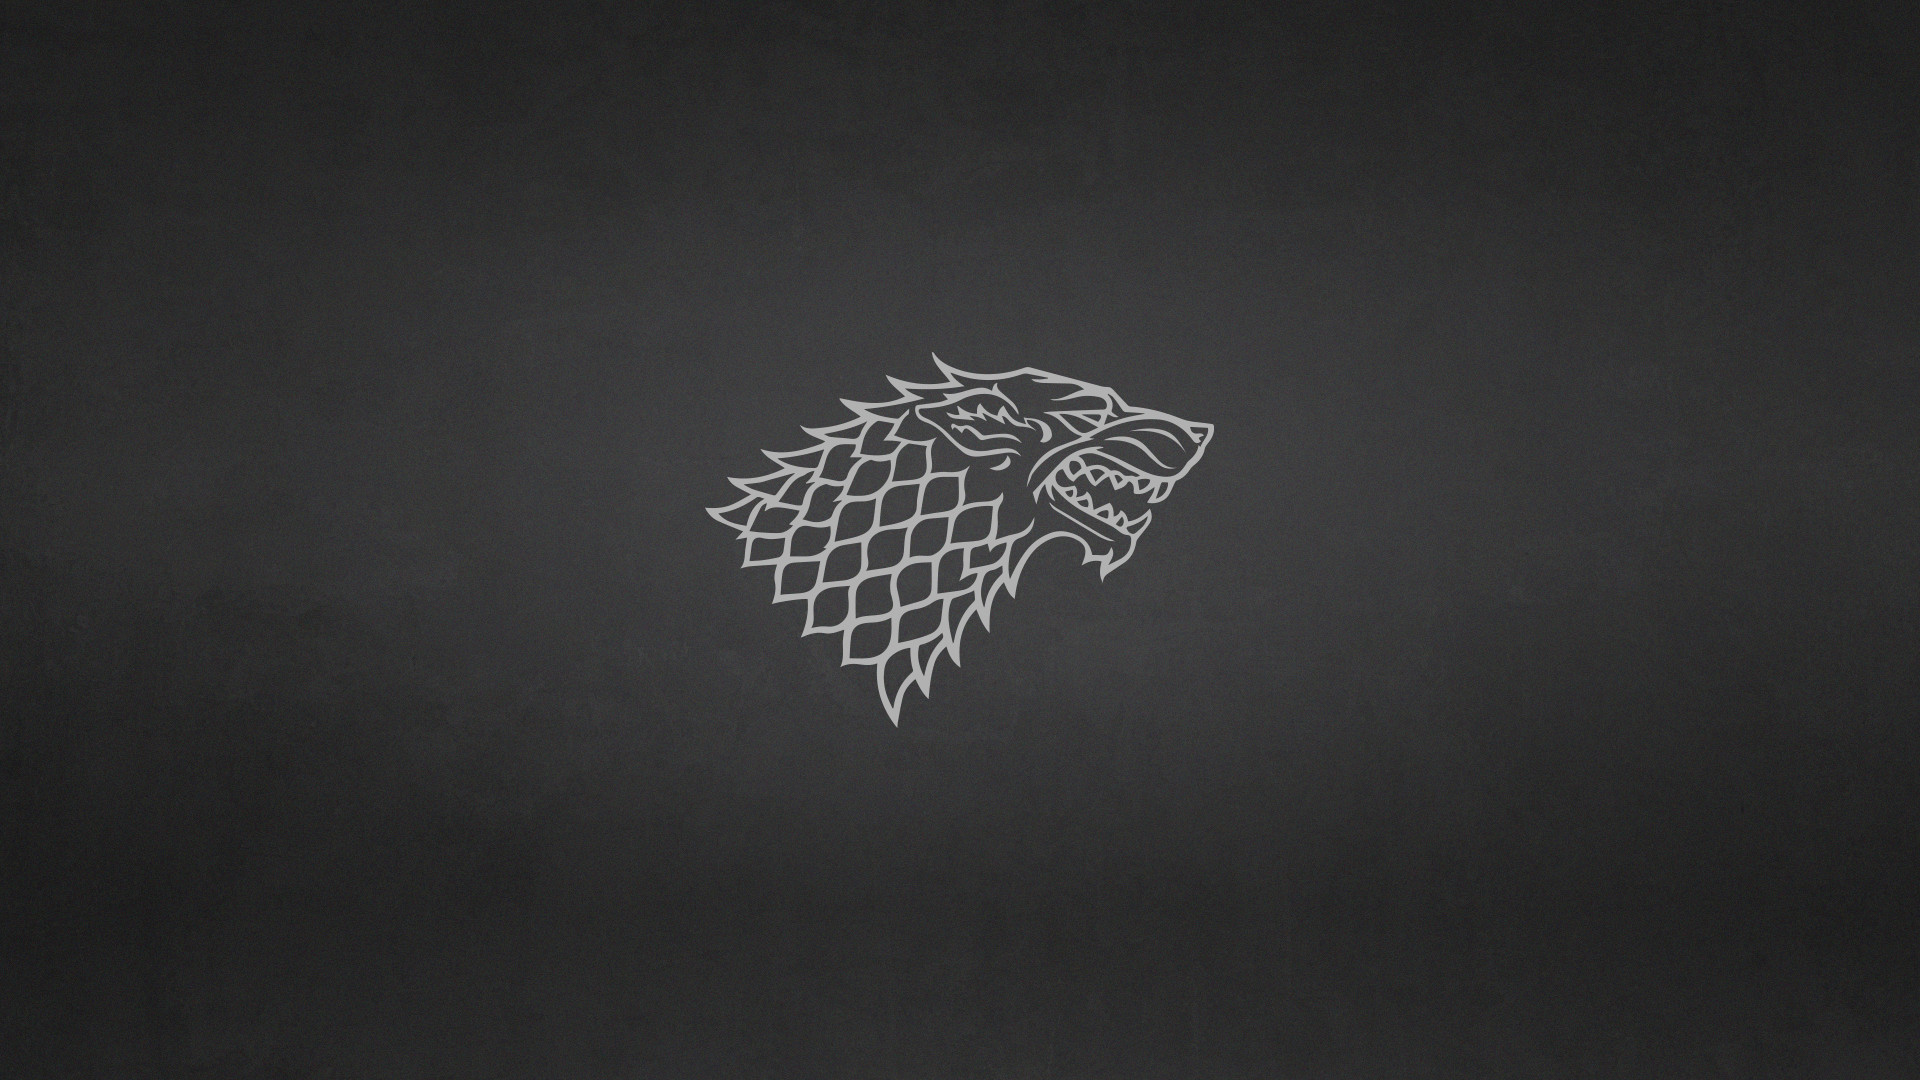 … Game of Thrones: House Stark Minimalist Wallpaper by elbarnzo